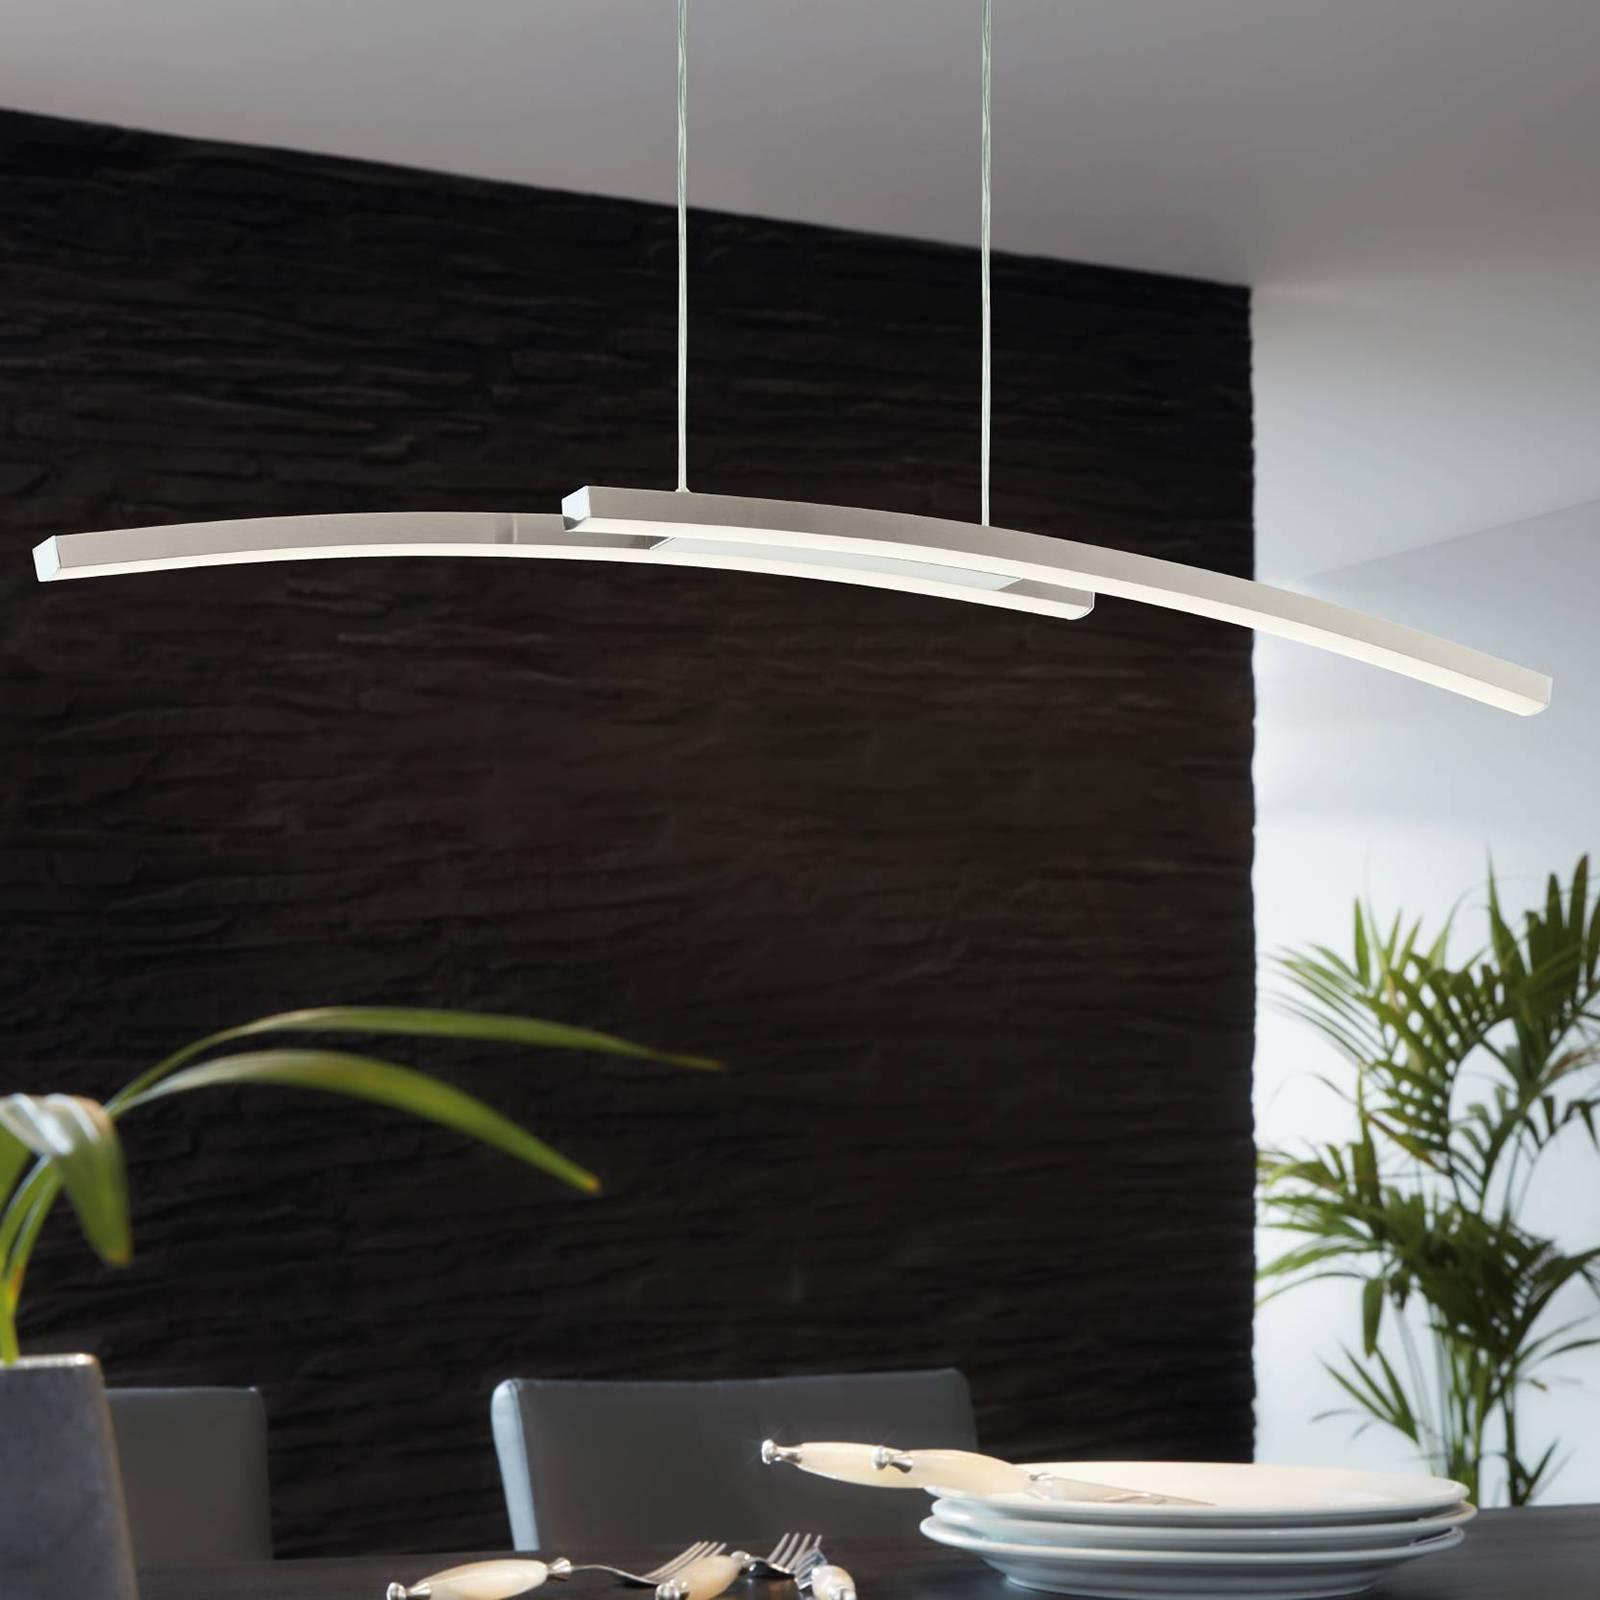 EGLO connect Fraioli-C -LED-riippuvalaisin kaareva